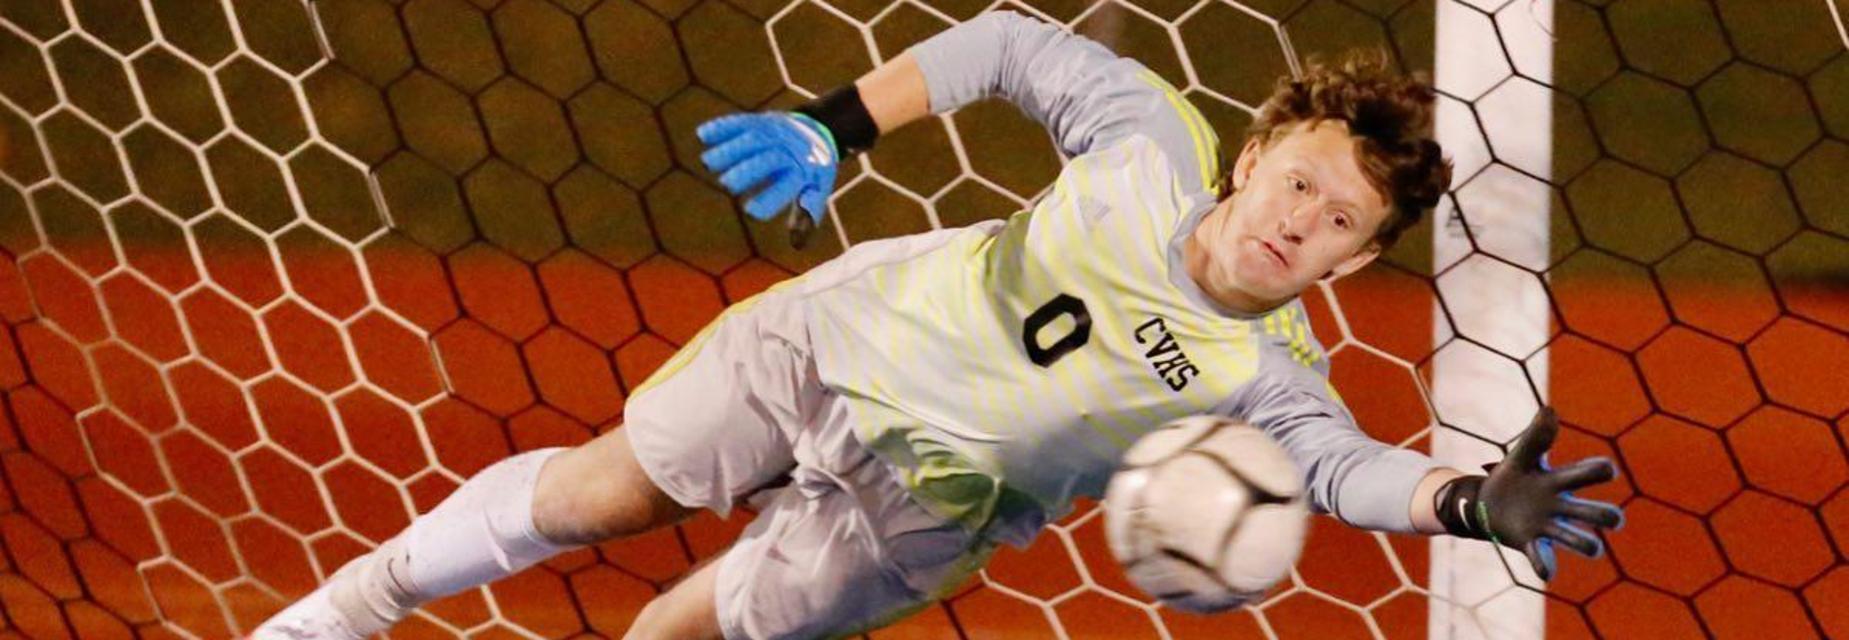 CVHS Soccer 20-21